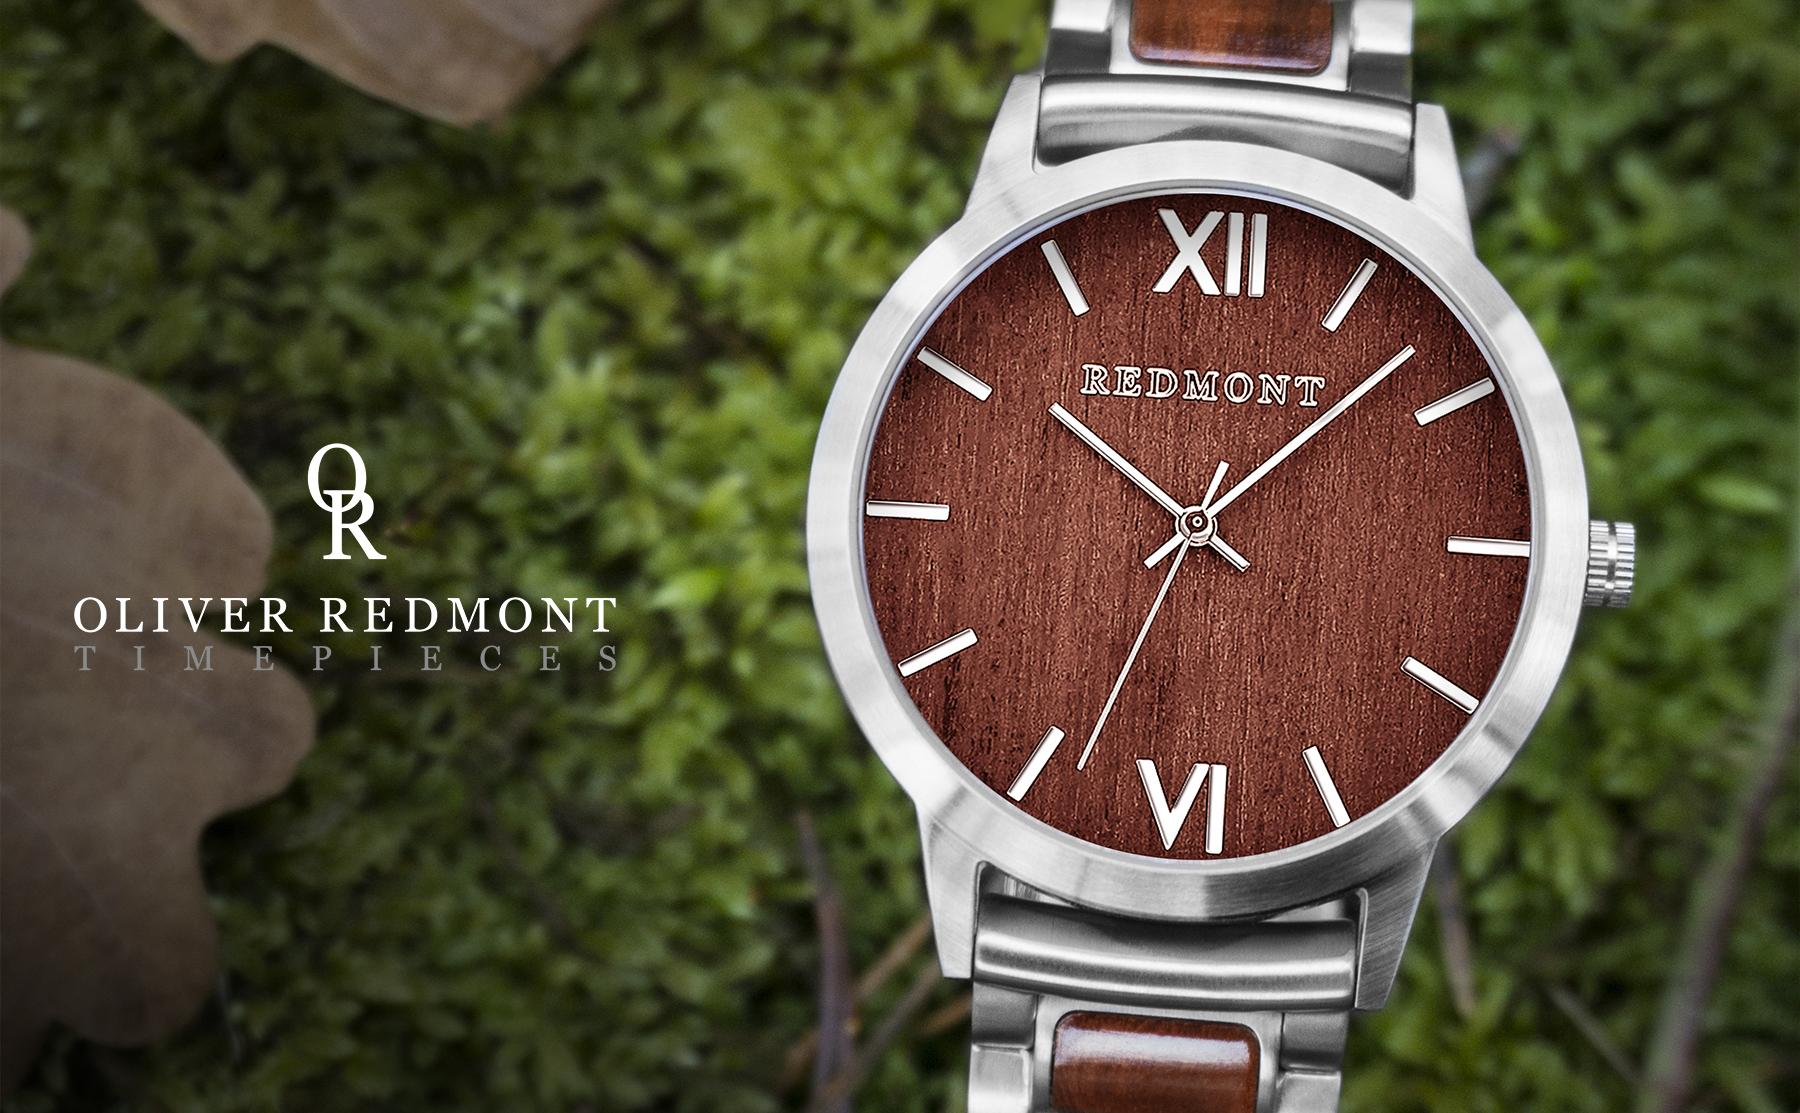 Maroon Steel Edition Oliver Redmont